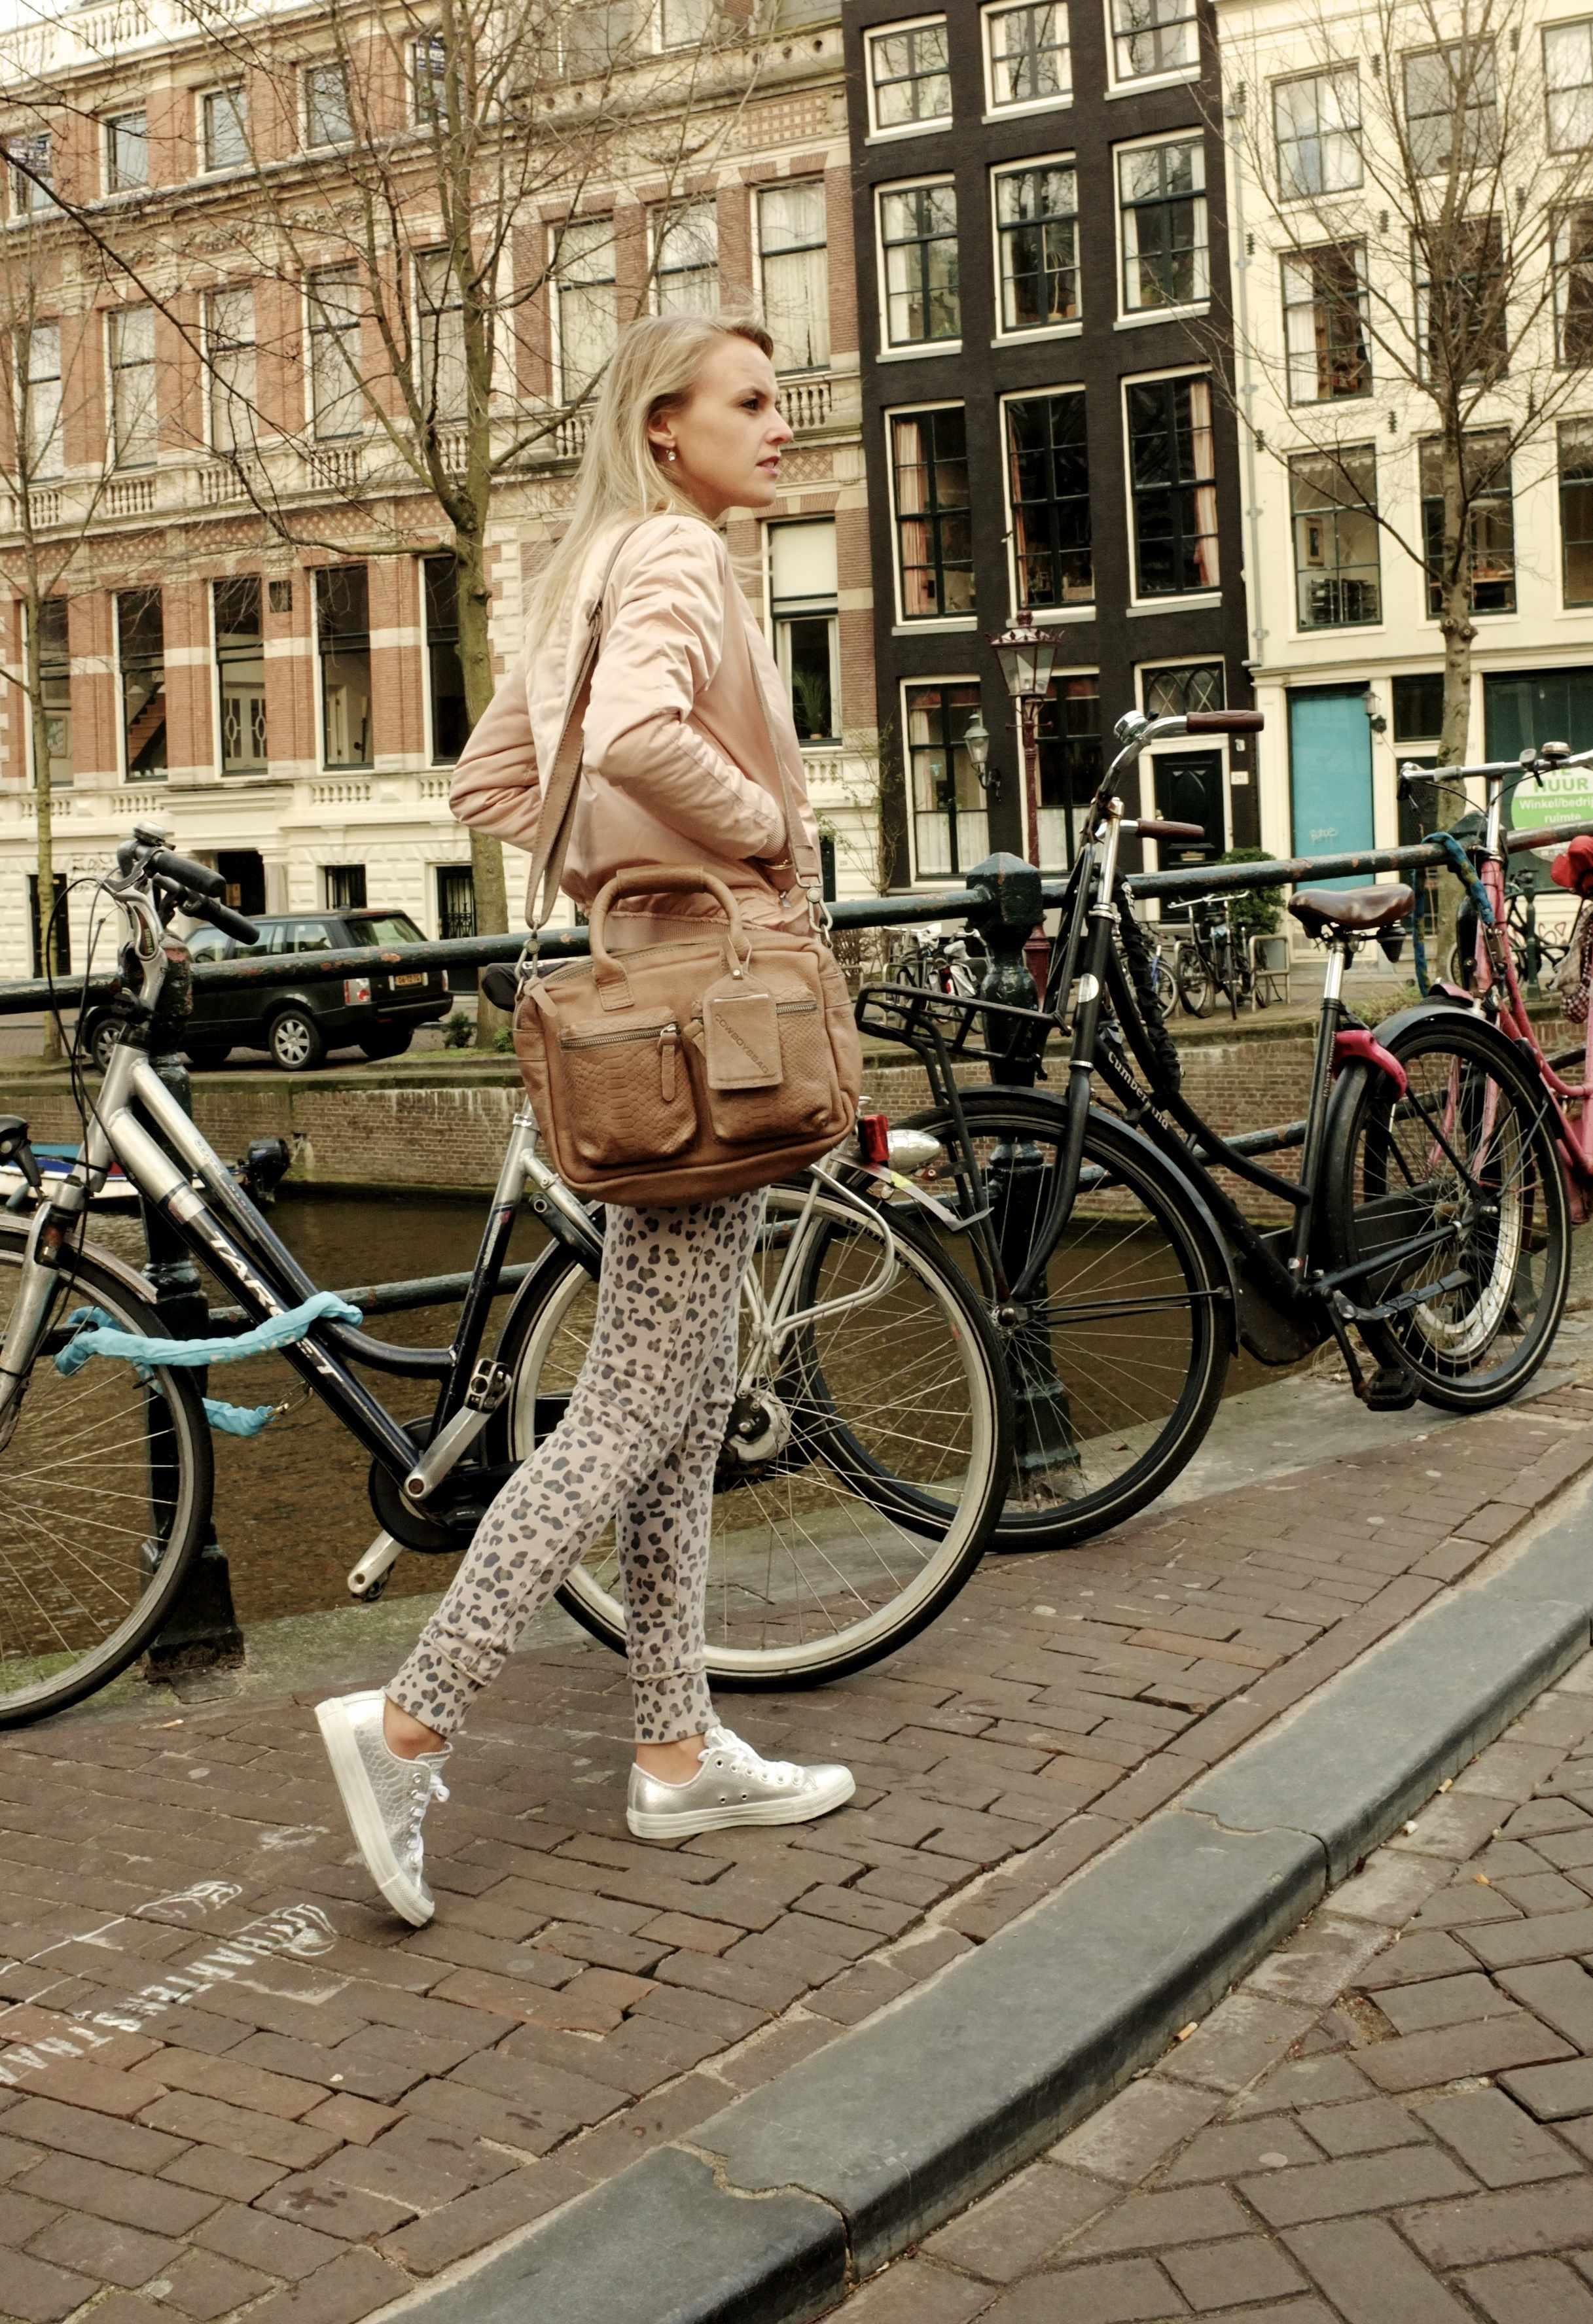 Bag at You - Work Cowboysbag - Herengracht